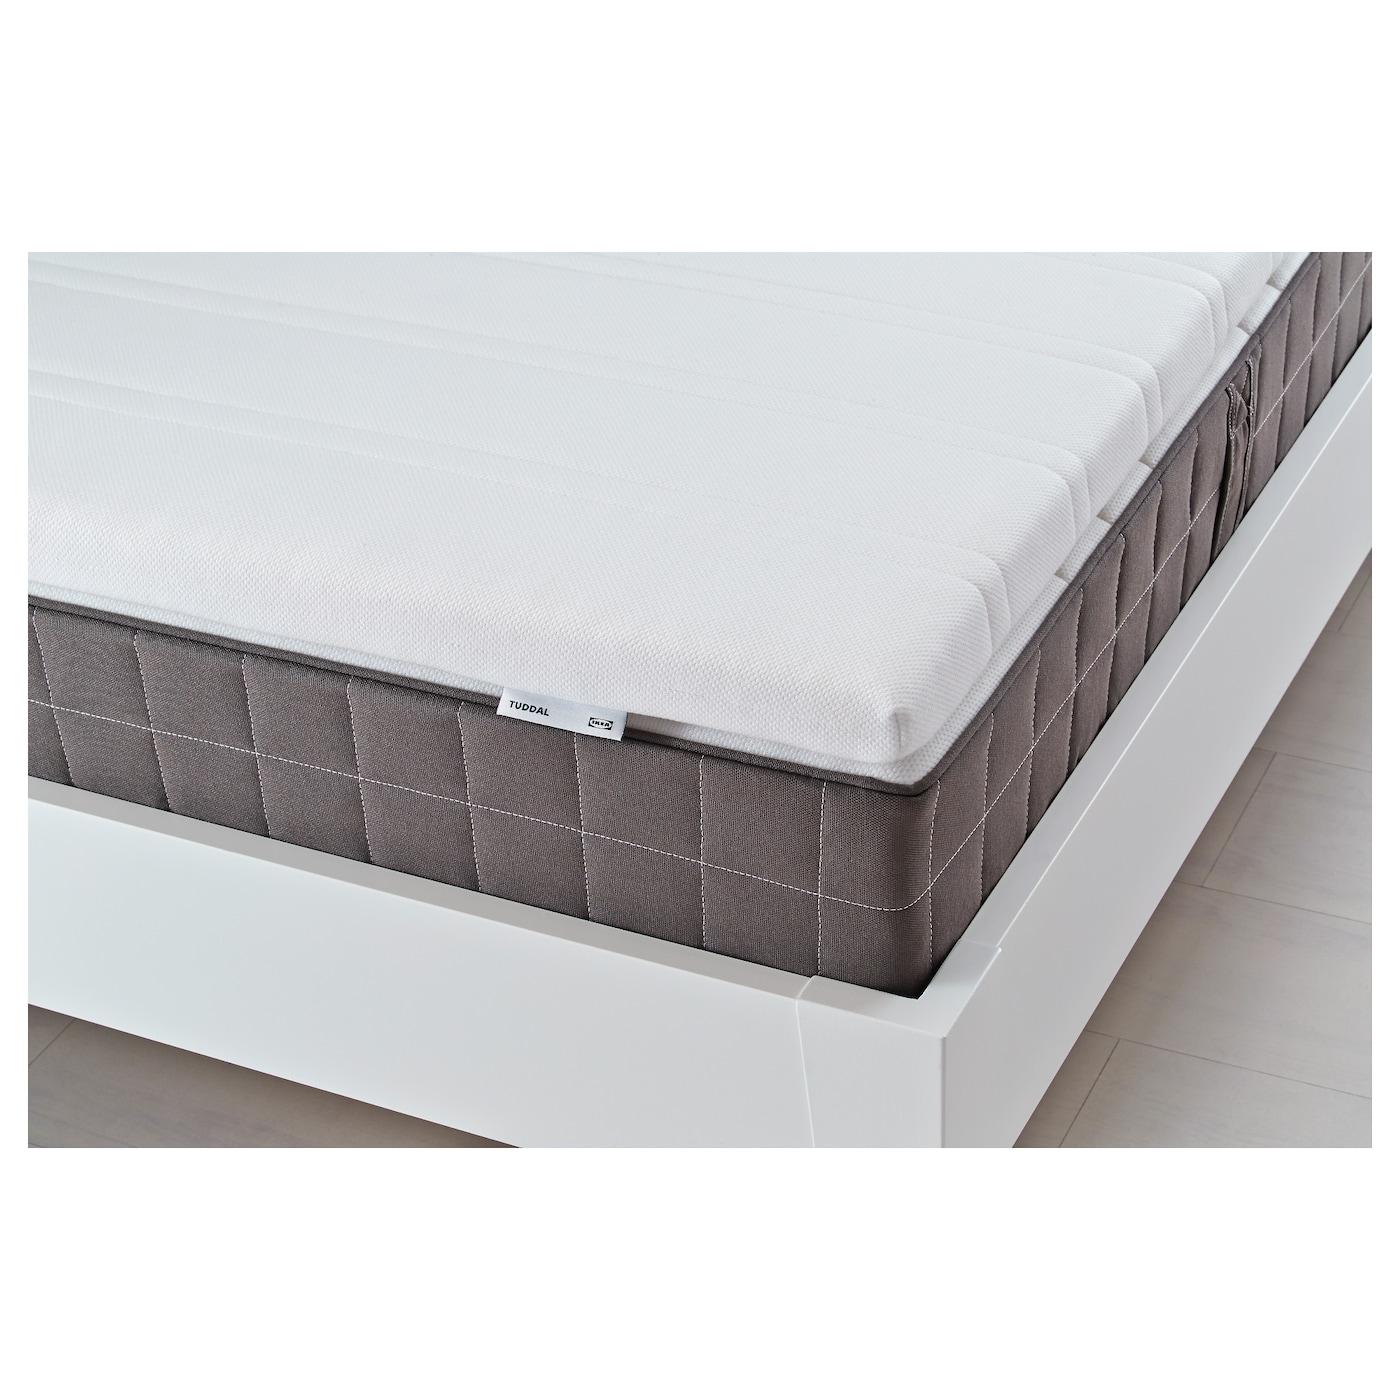 tuddal mattress topper white standard double ikea. Black Bedroom Furniture Sets. Home Design Ideas